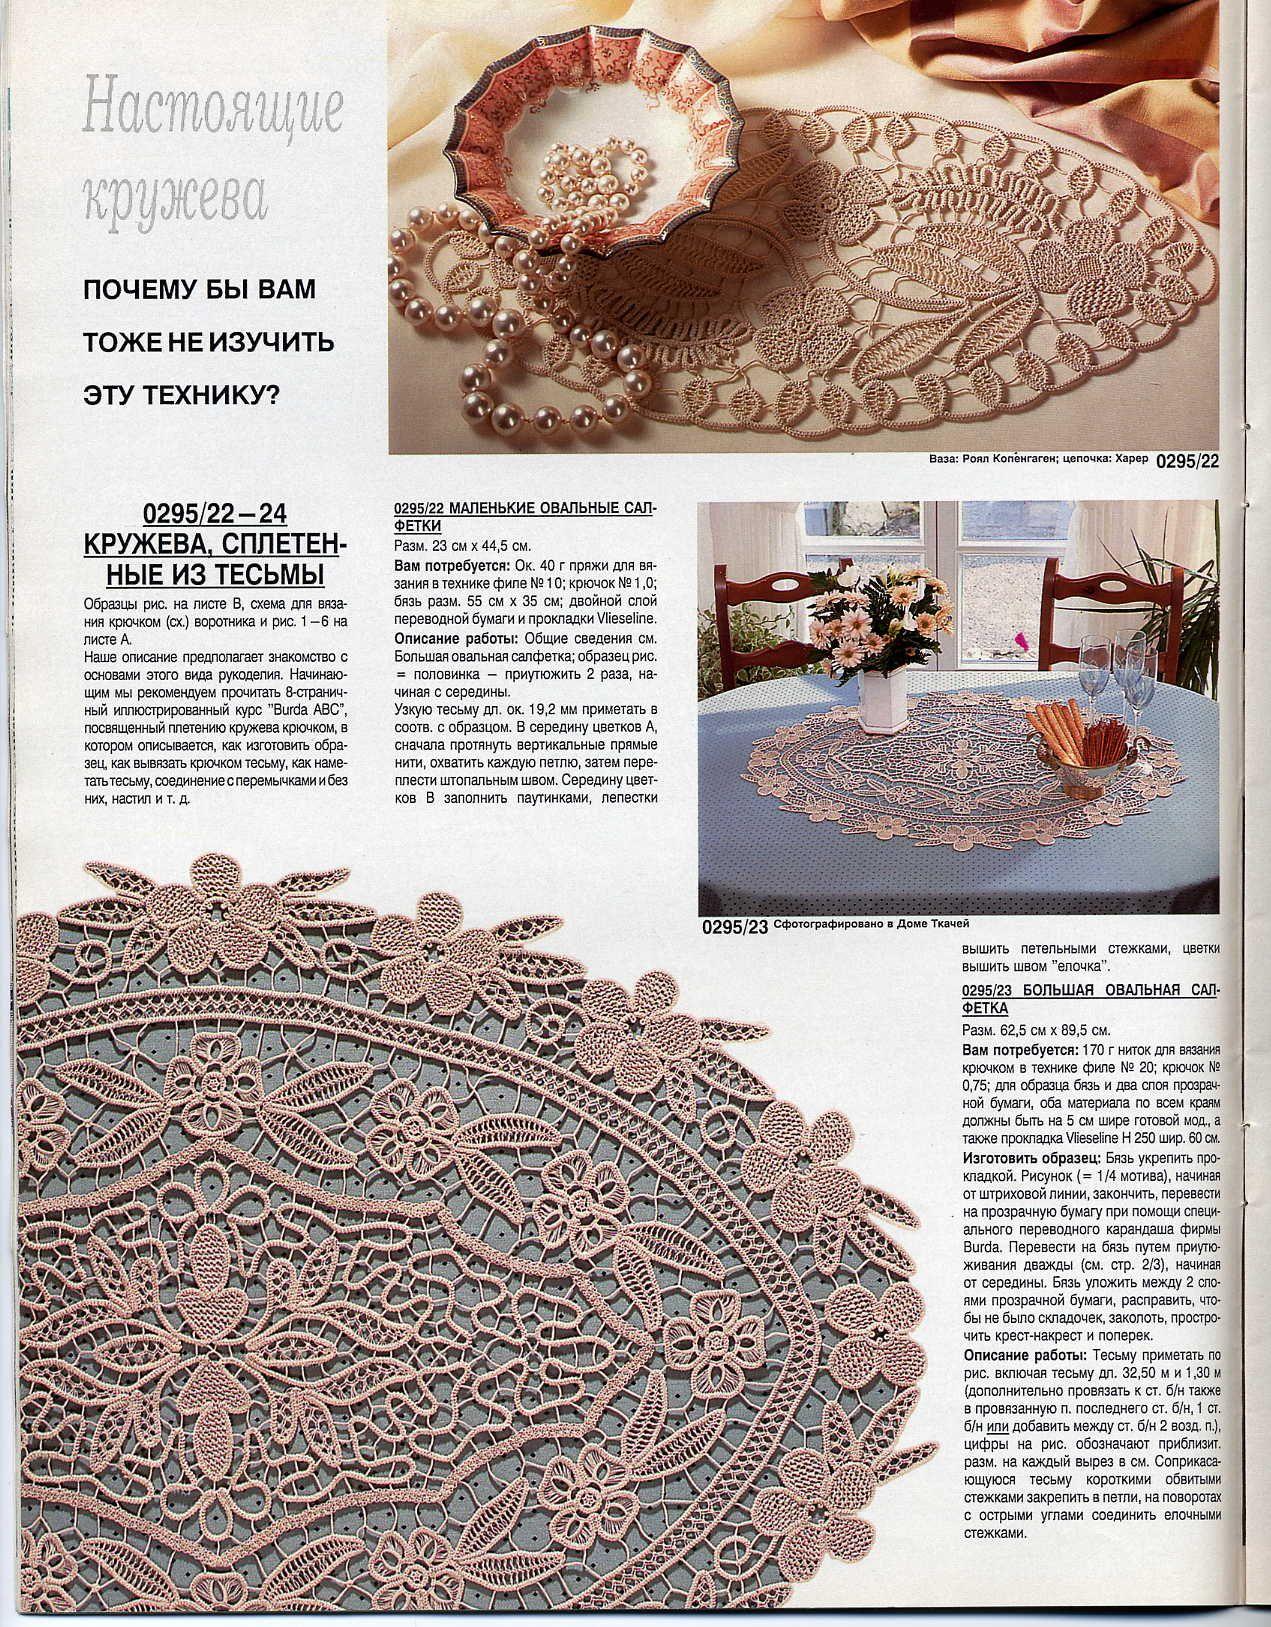 Romanian Point Lace crochet (aka Macramé Crochet Lace) from the February, 1995 edition of Anna Burda magazine.